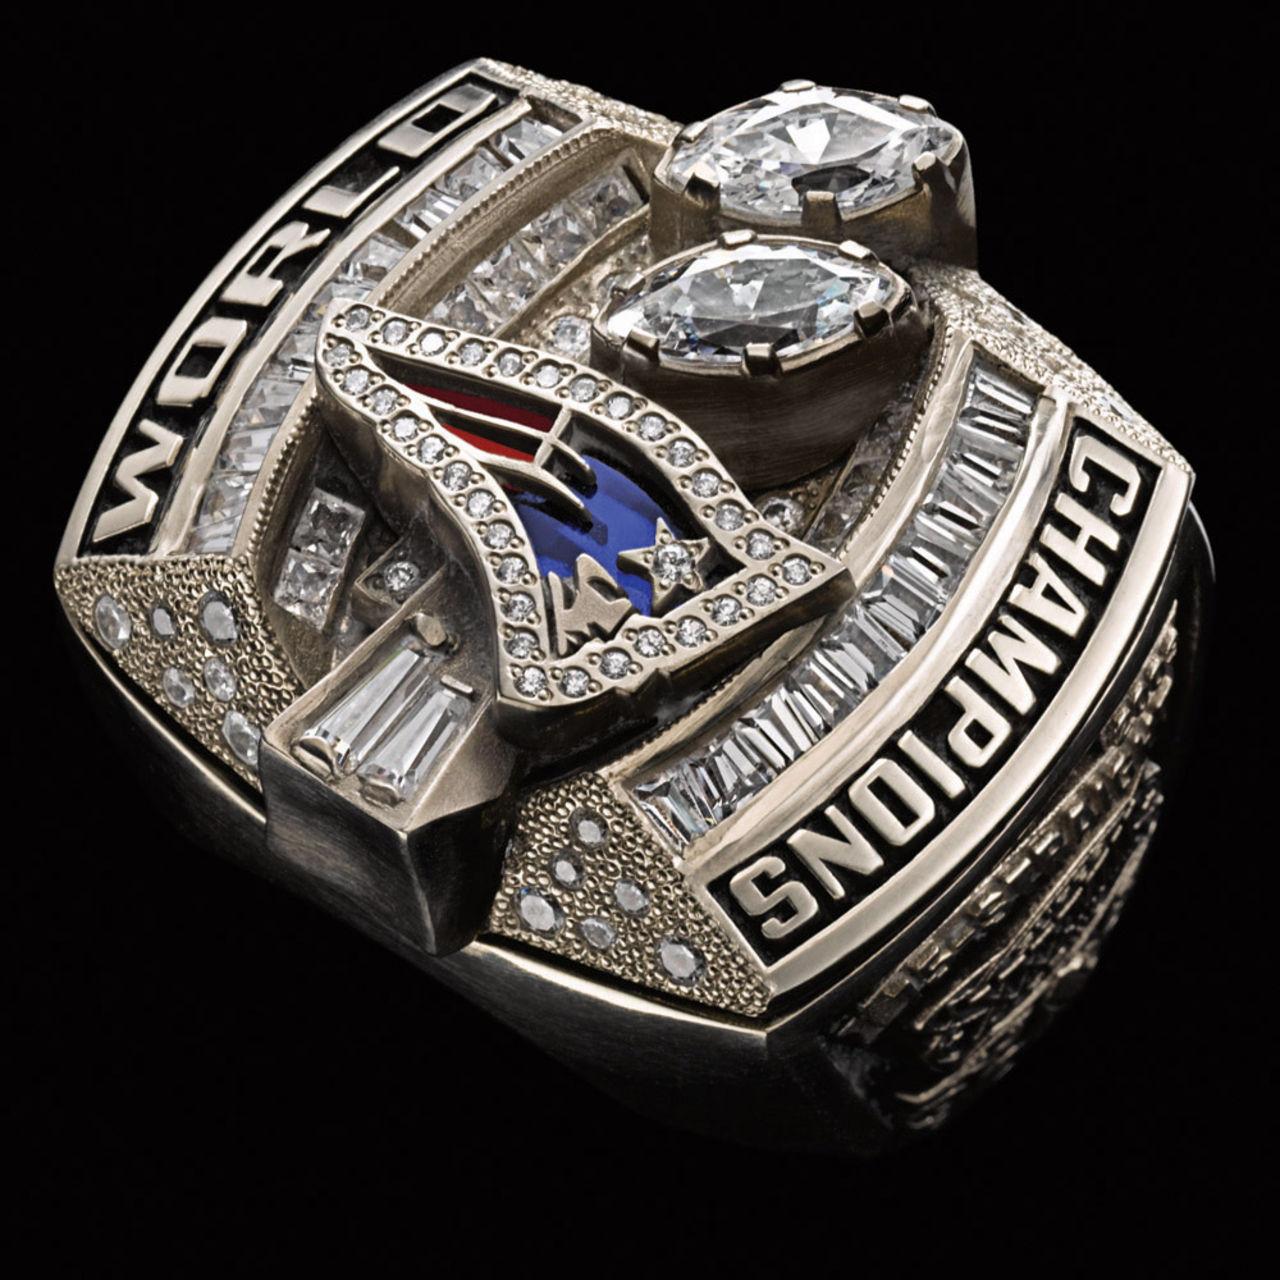 New England Patriots 2004 champions ring